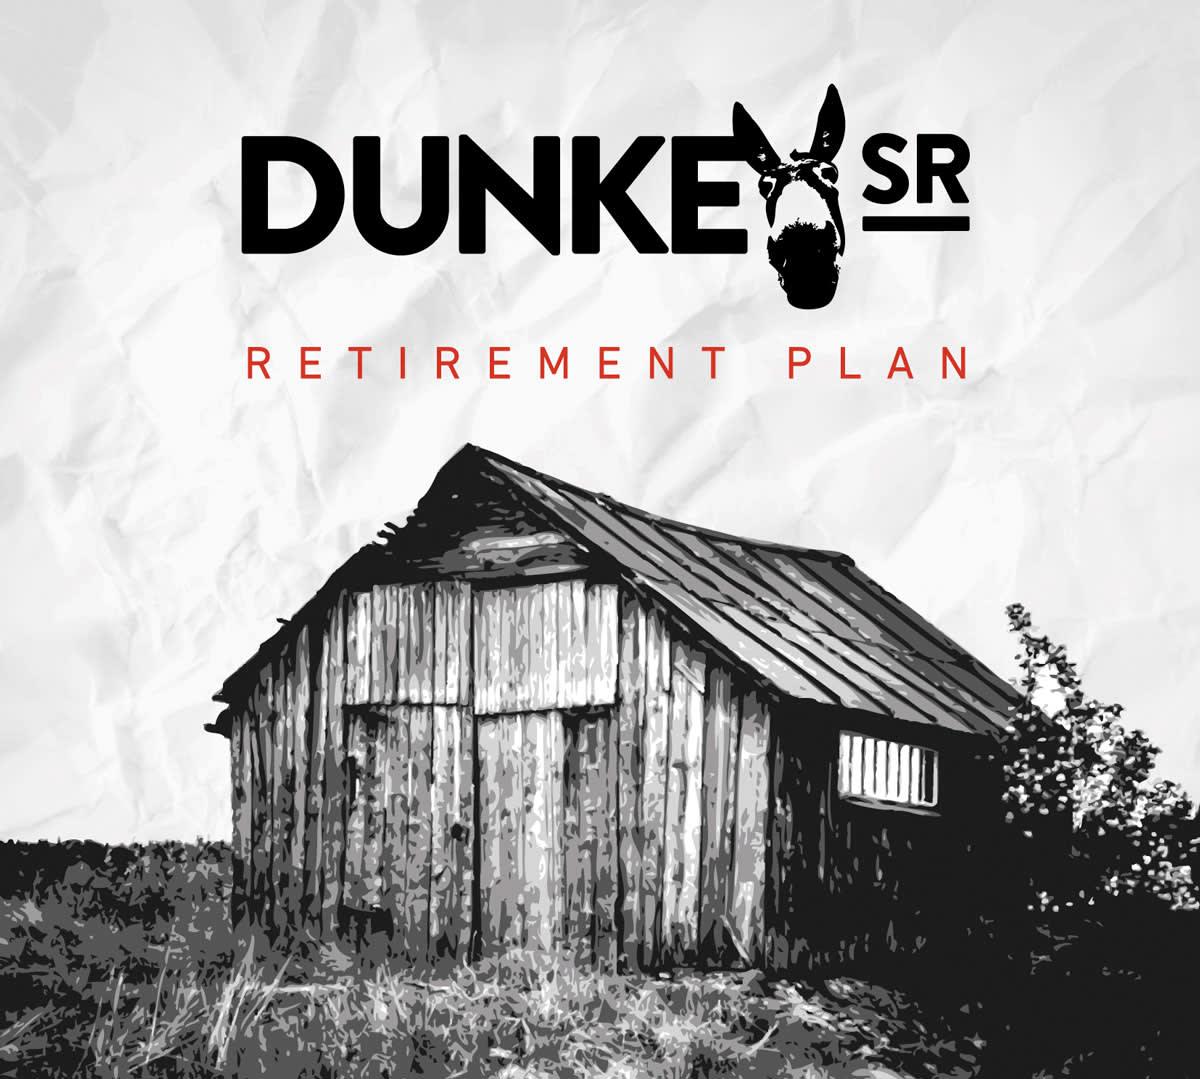 Dunkey SR – Retirement Plan